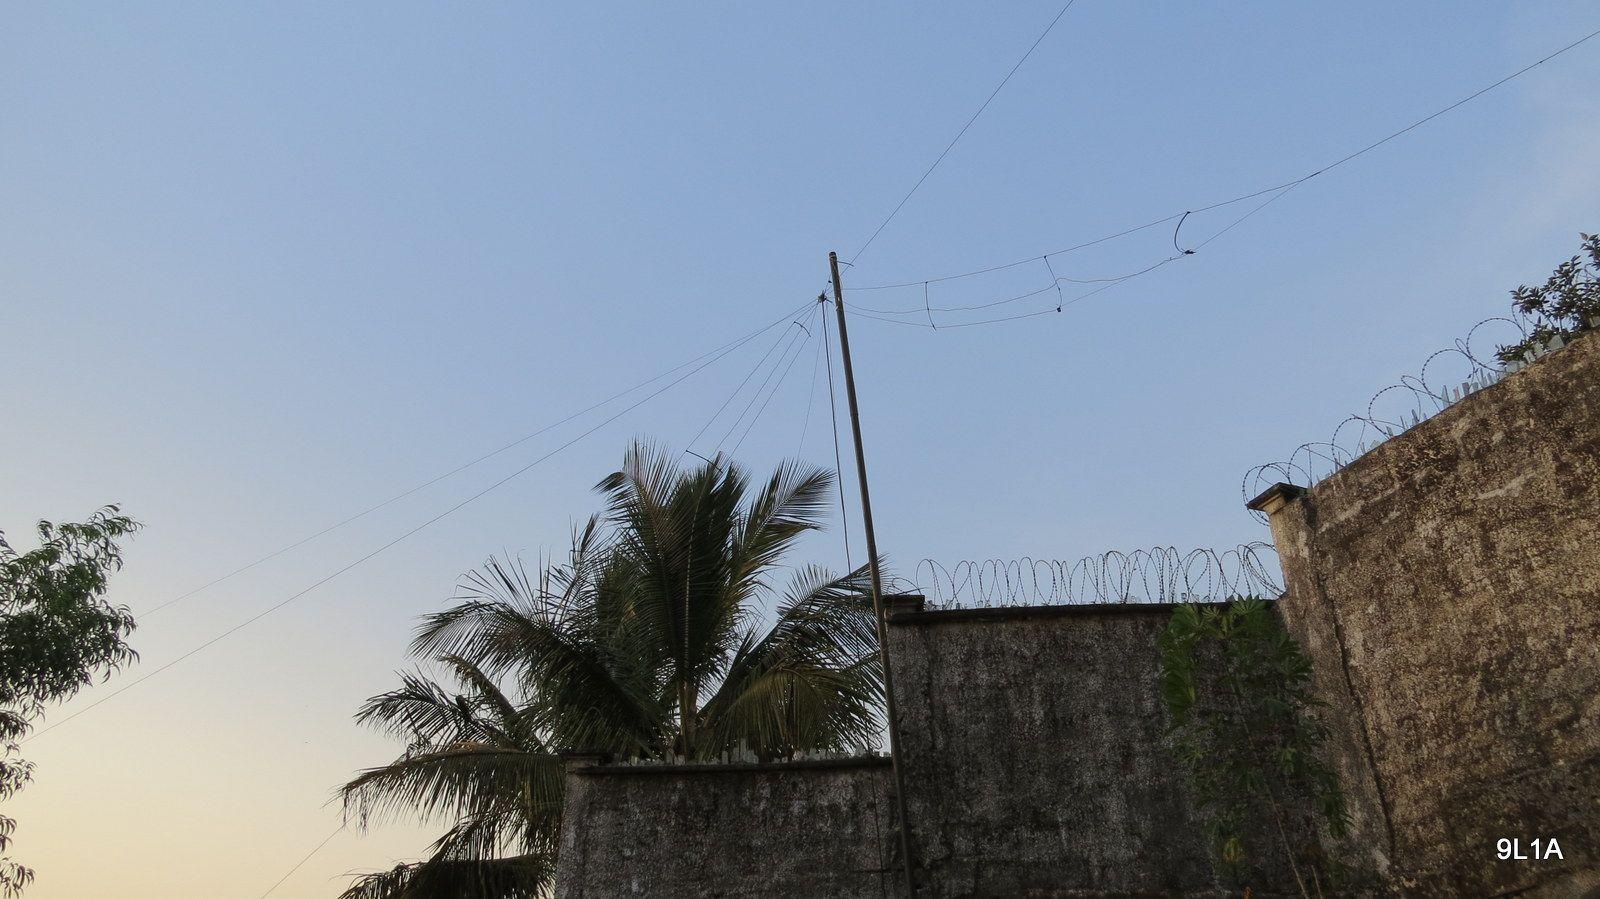 Sierra Leone 9L1A News Antenna 4